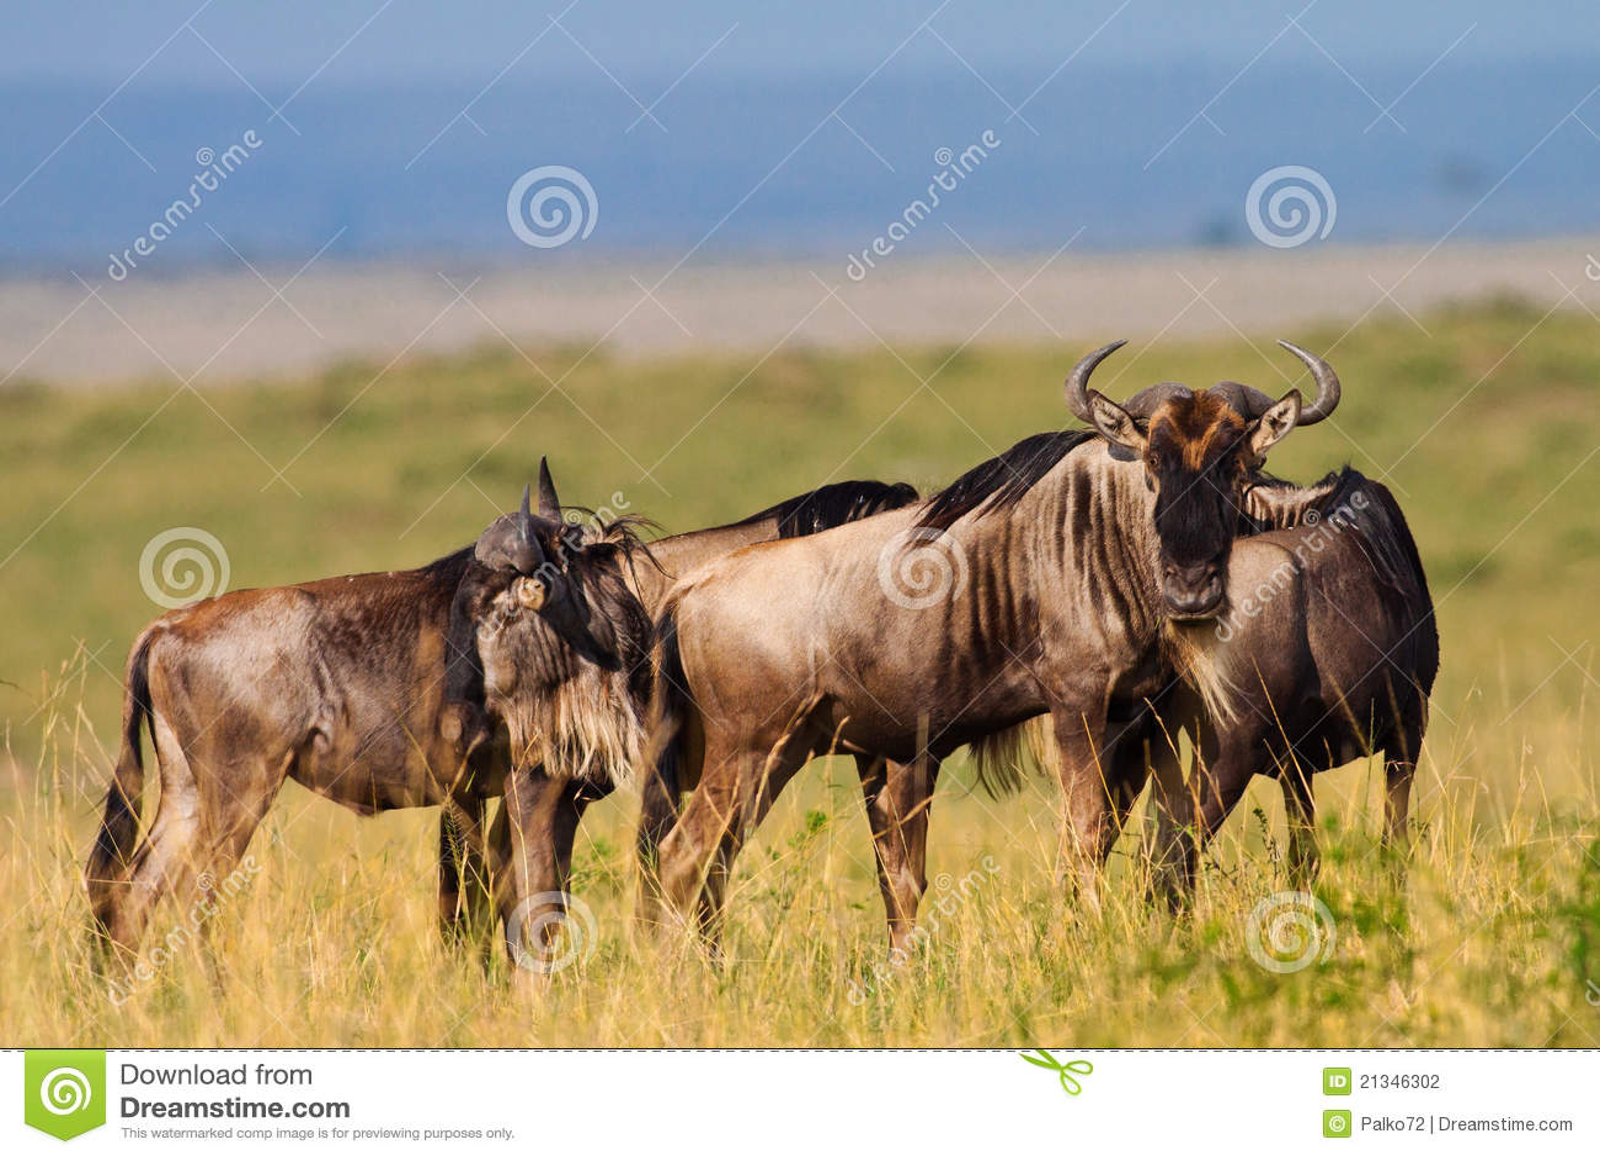 Wildebeests bleus